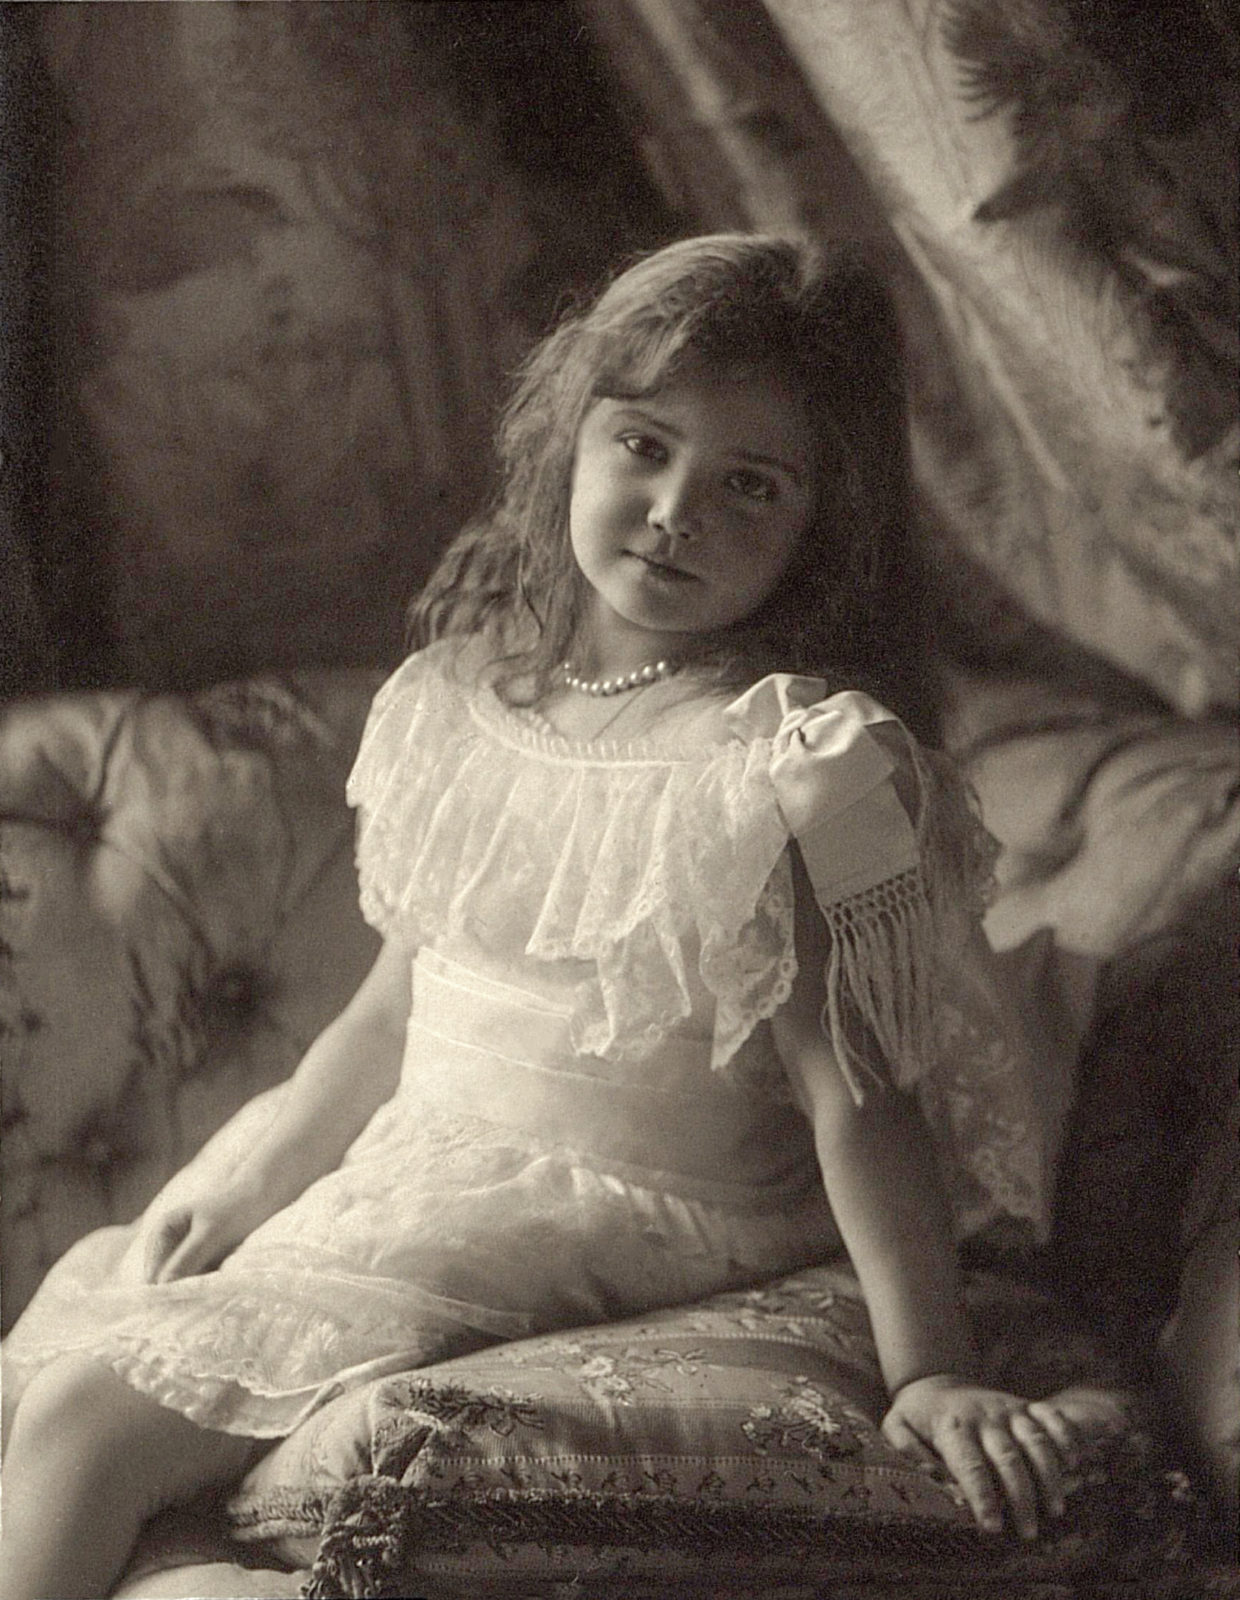 Grand Duchess Maria Nikolaevna. The third daughter of Emperor Nicholas II and Empress Alexandra Feodorovna. At home.